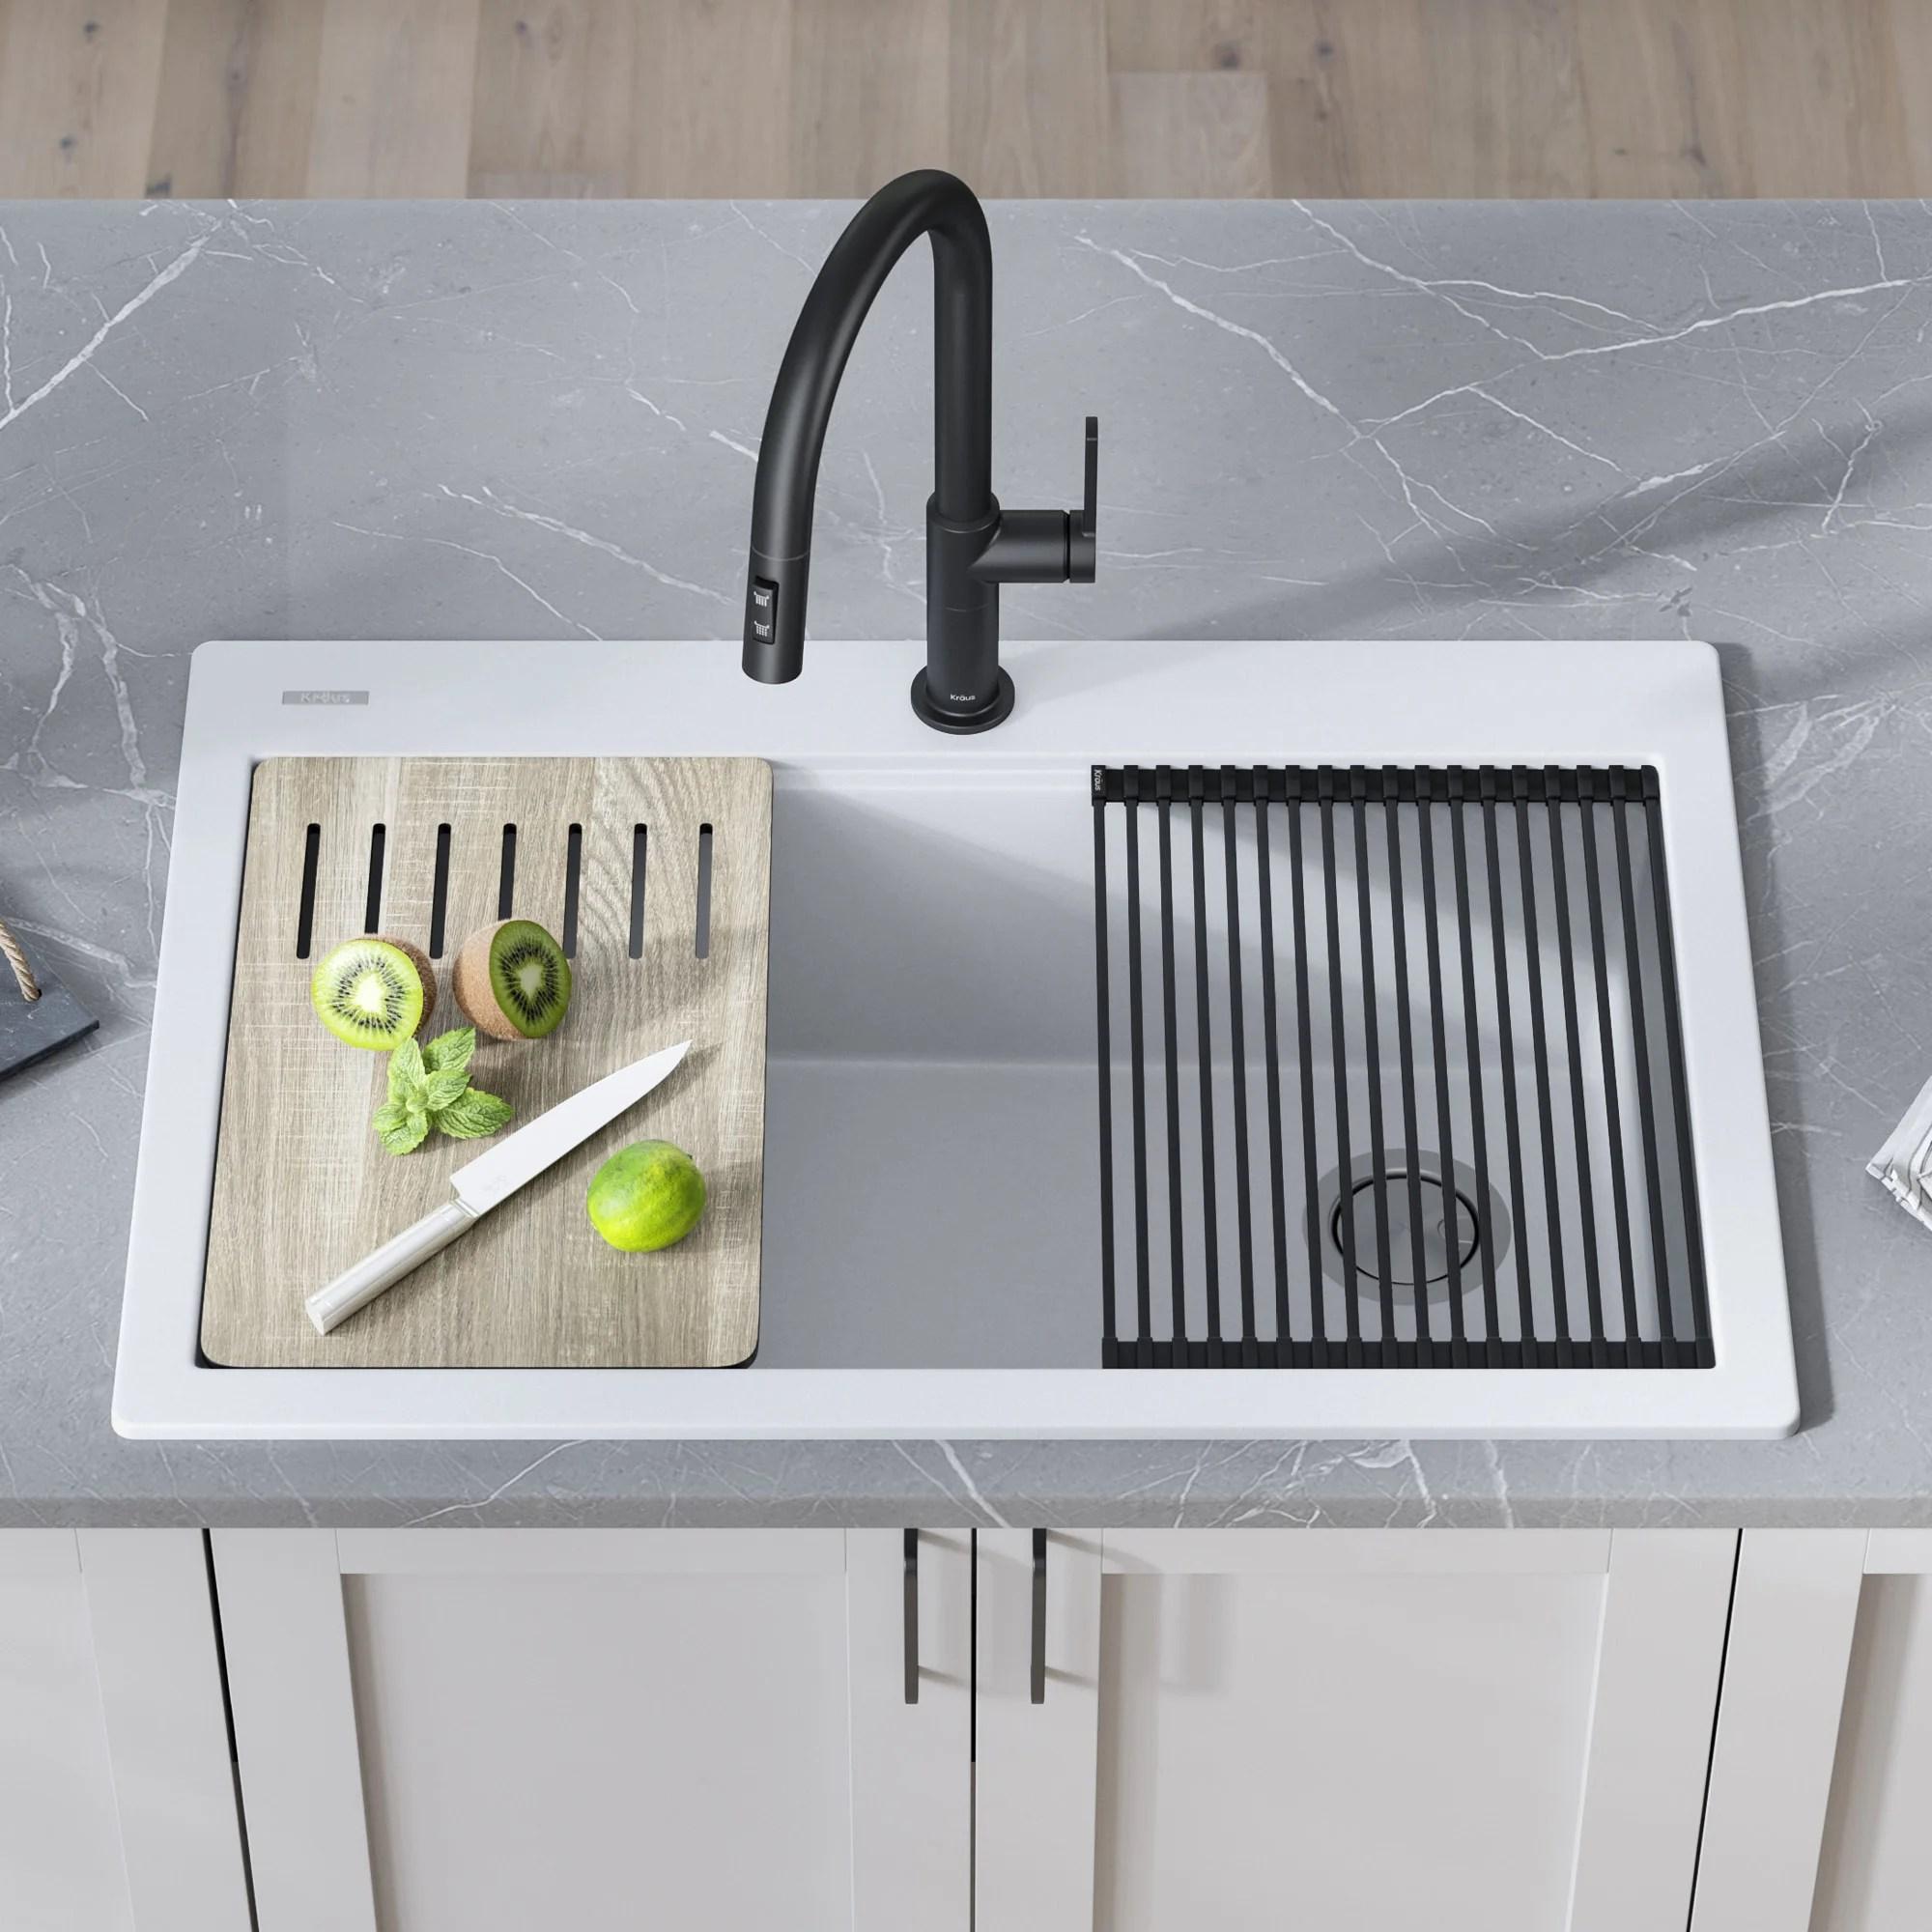 kraus bellucci workstation 33 inch granite composite single bowl drop in kitchen sink with accessories in metallic brown kgtw2 33mbr